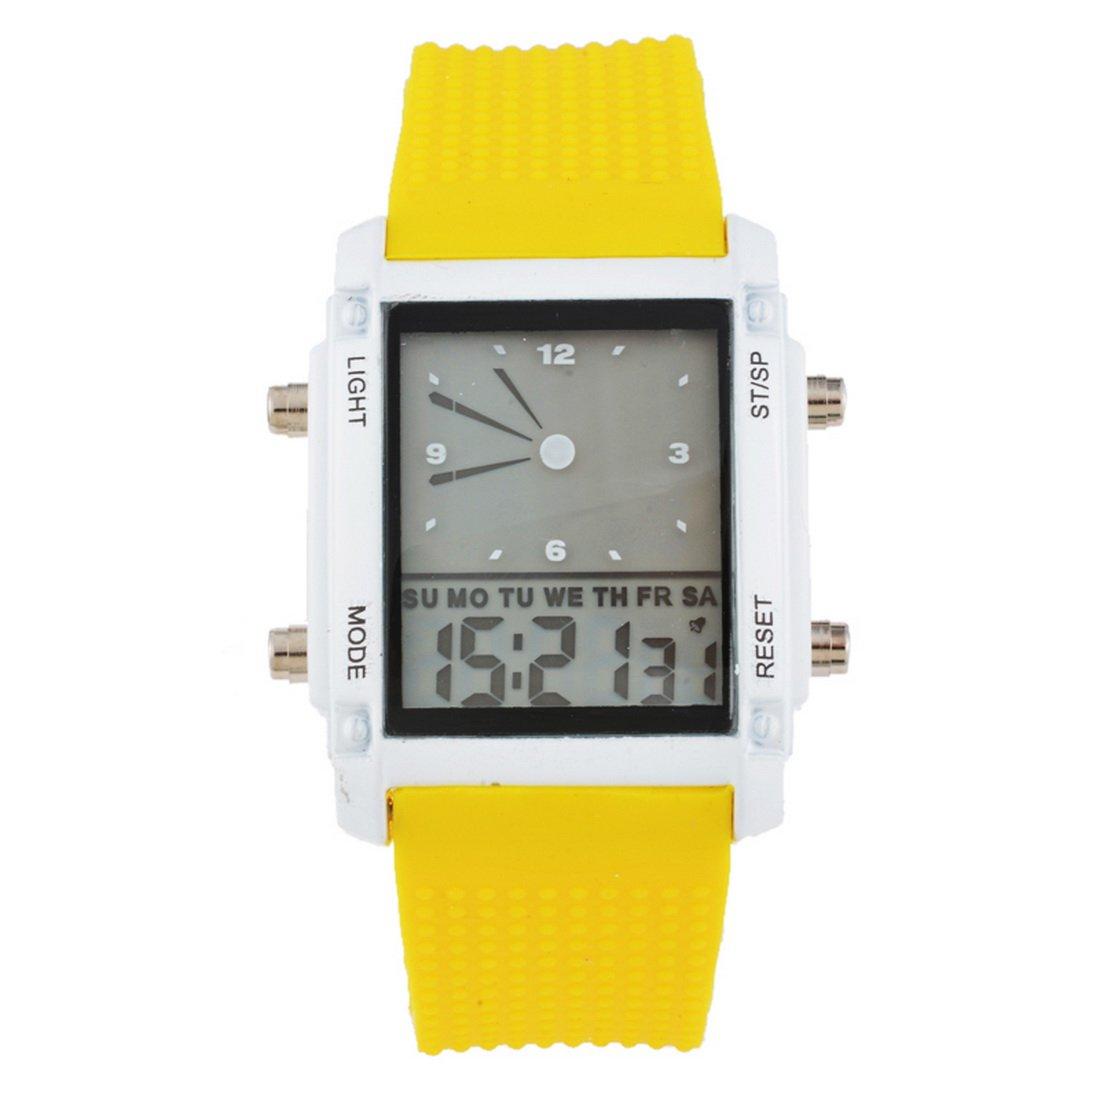 loweryeahカラフルLuminous Watch二重表示電子腕時計LEDスポーツウォッチ26 cm B07BTCBS7L